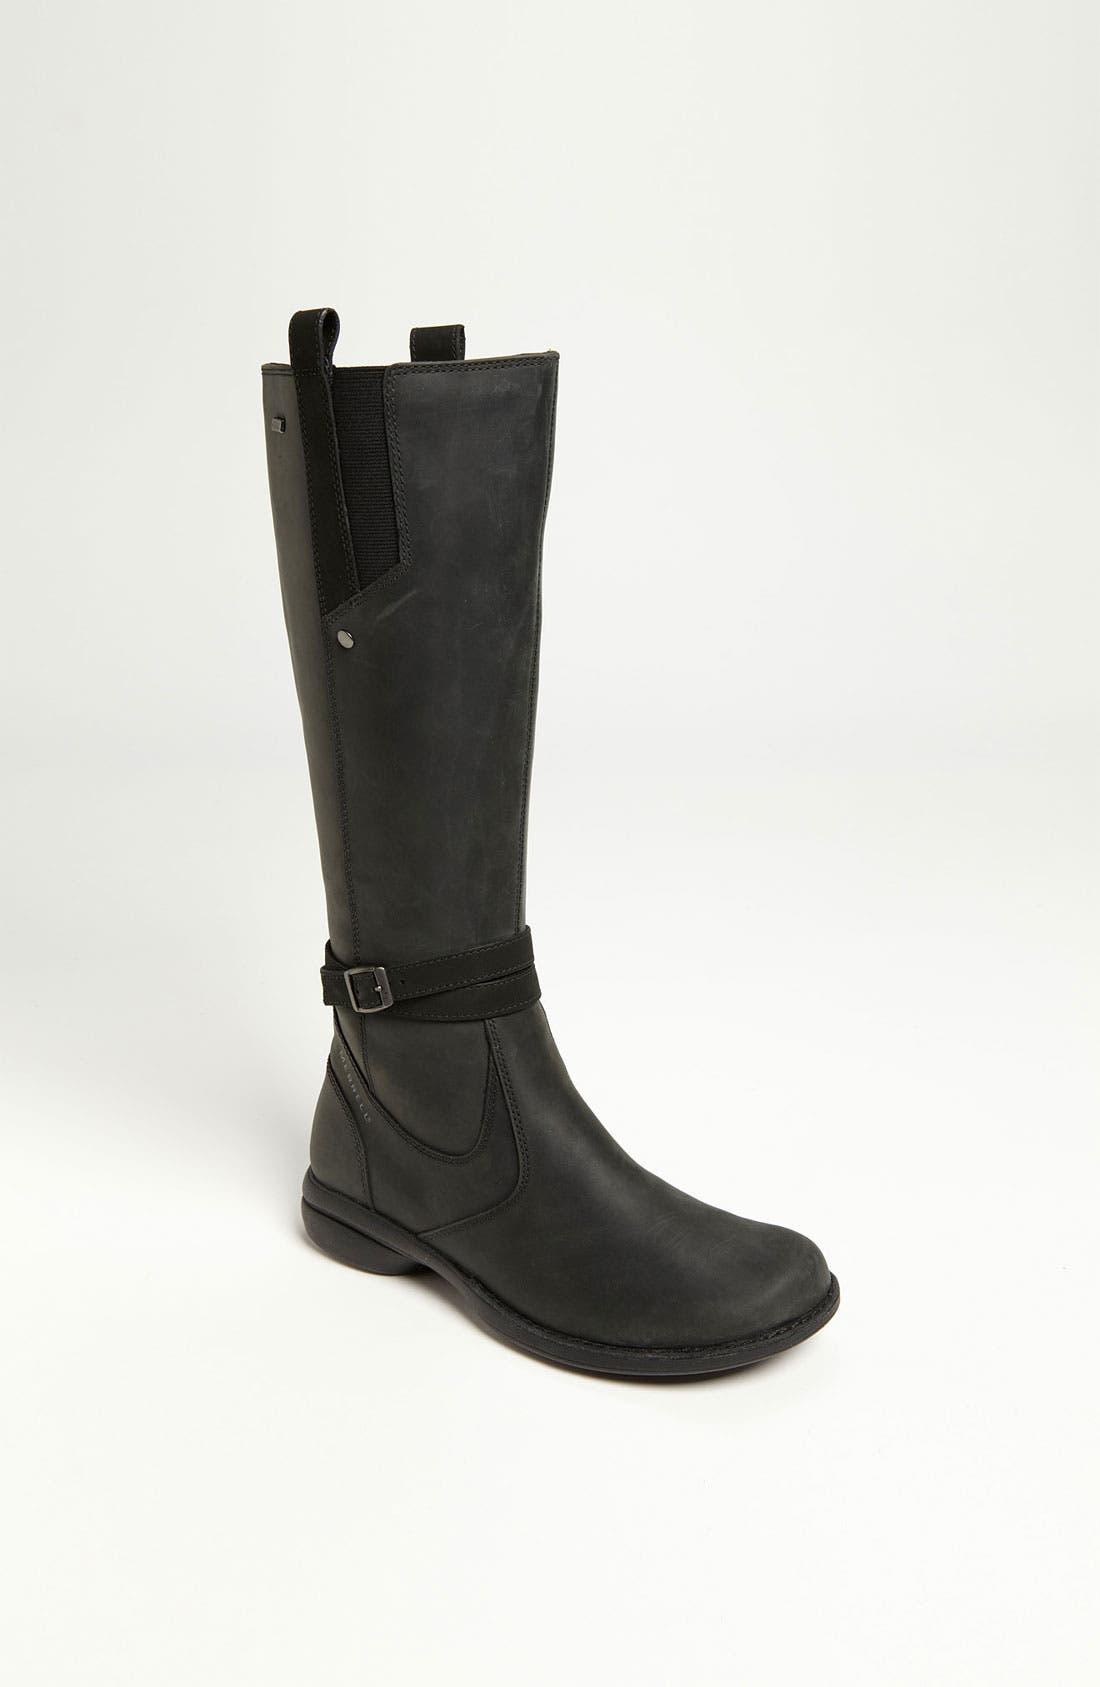 Main Image - Merrell 'Captiva Strap' Waterproof Boot